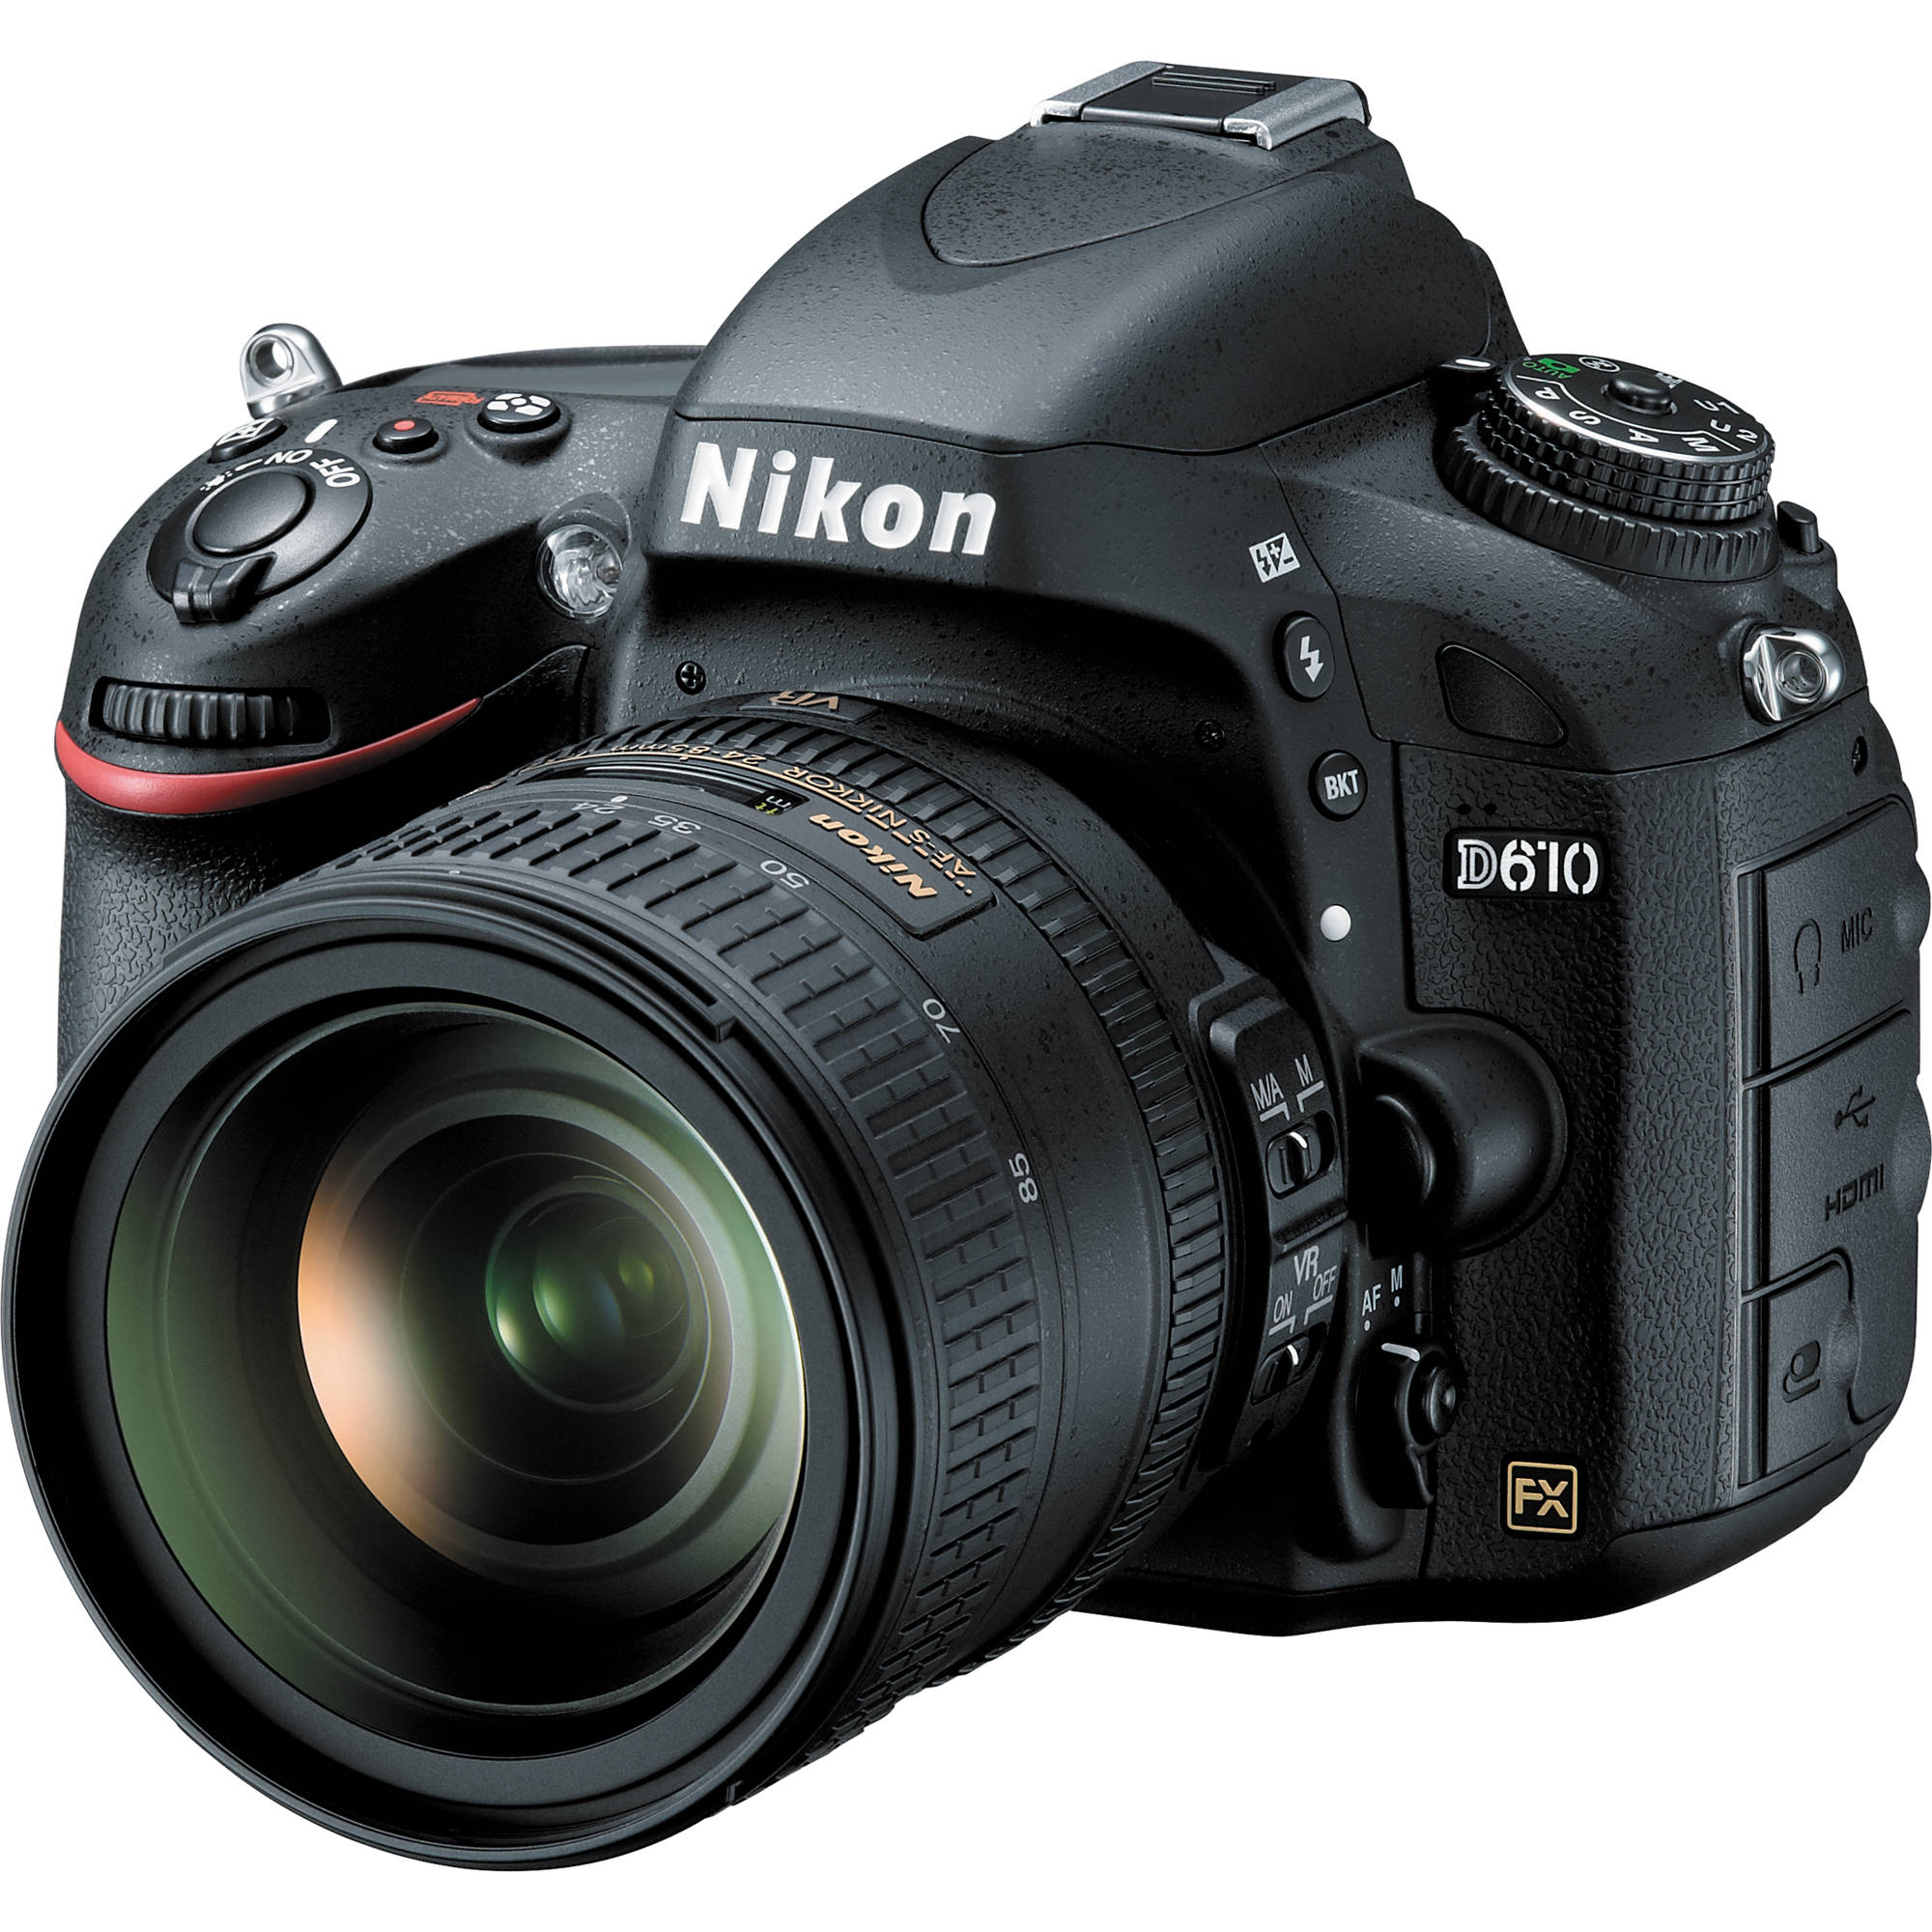 Nikon D610 DSLR Camera with 24-85mm Lens 13305 Nikon D610 ...